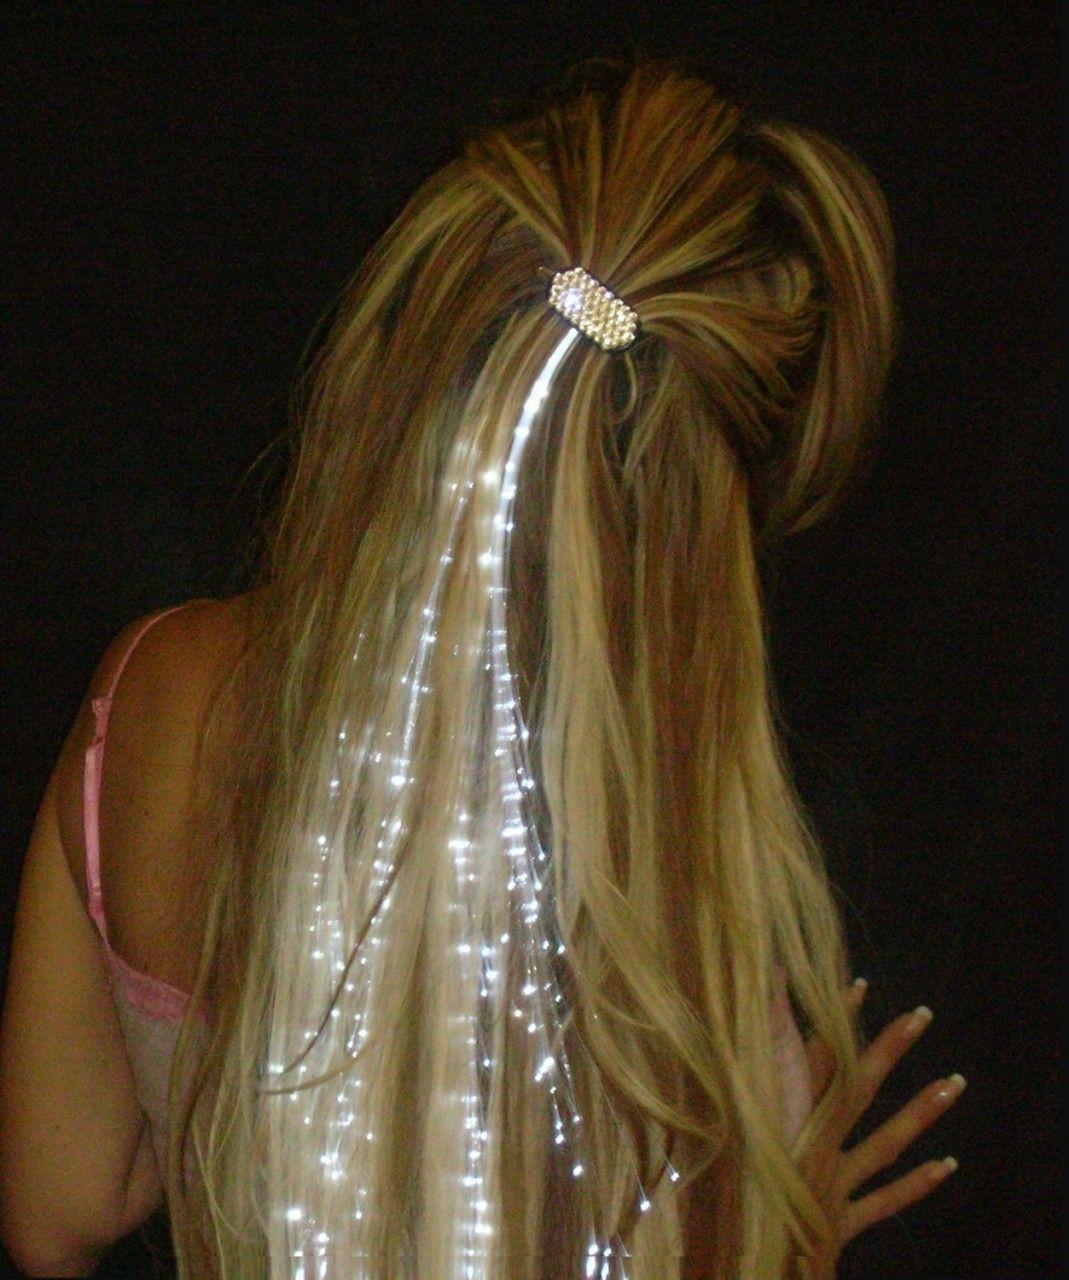 White Starlight Fiber Optic Hair Extensions 6165 My Style